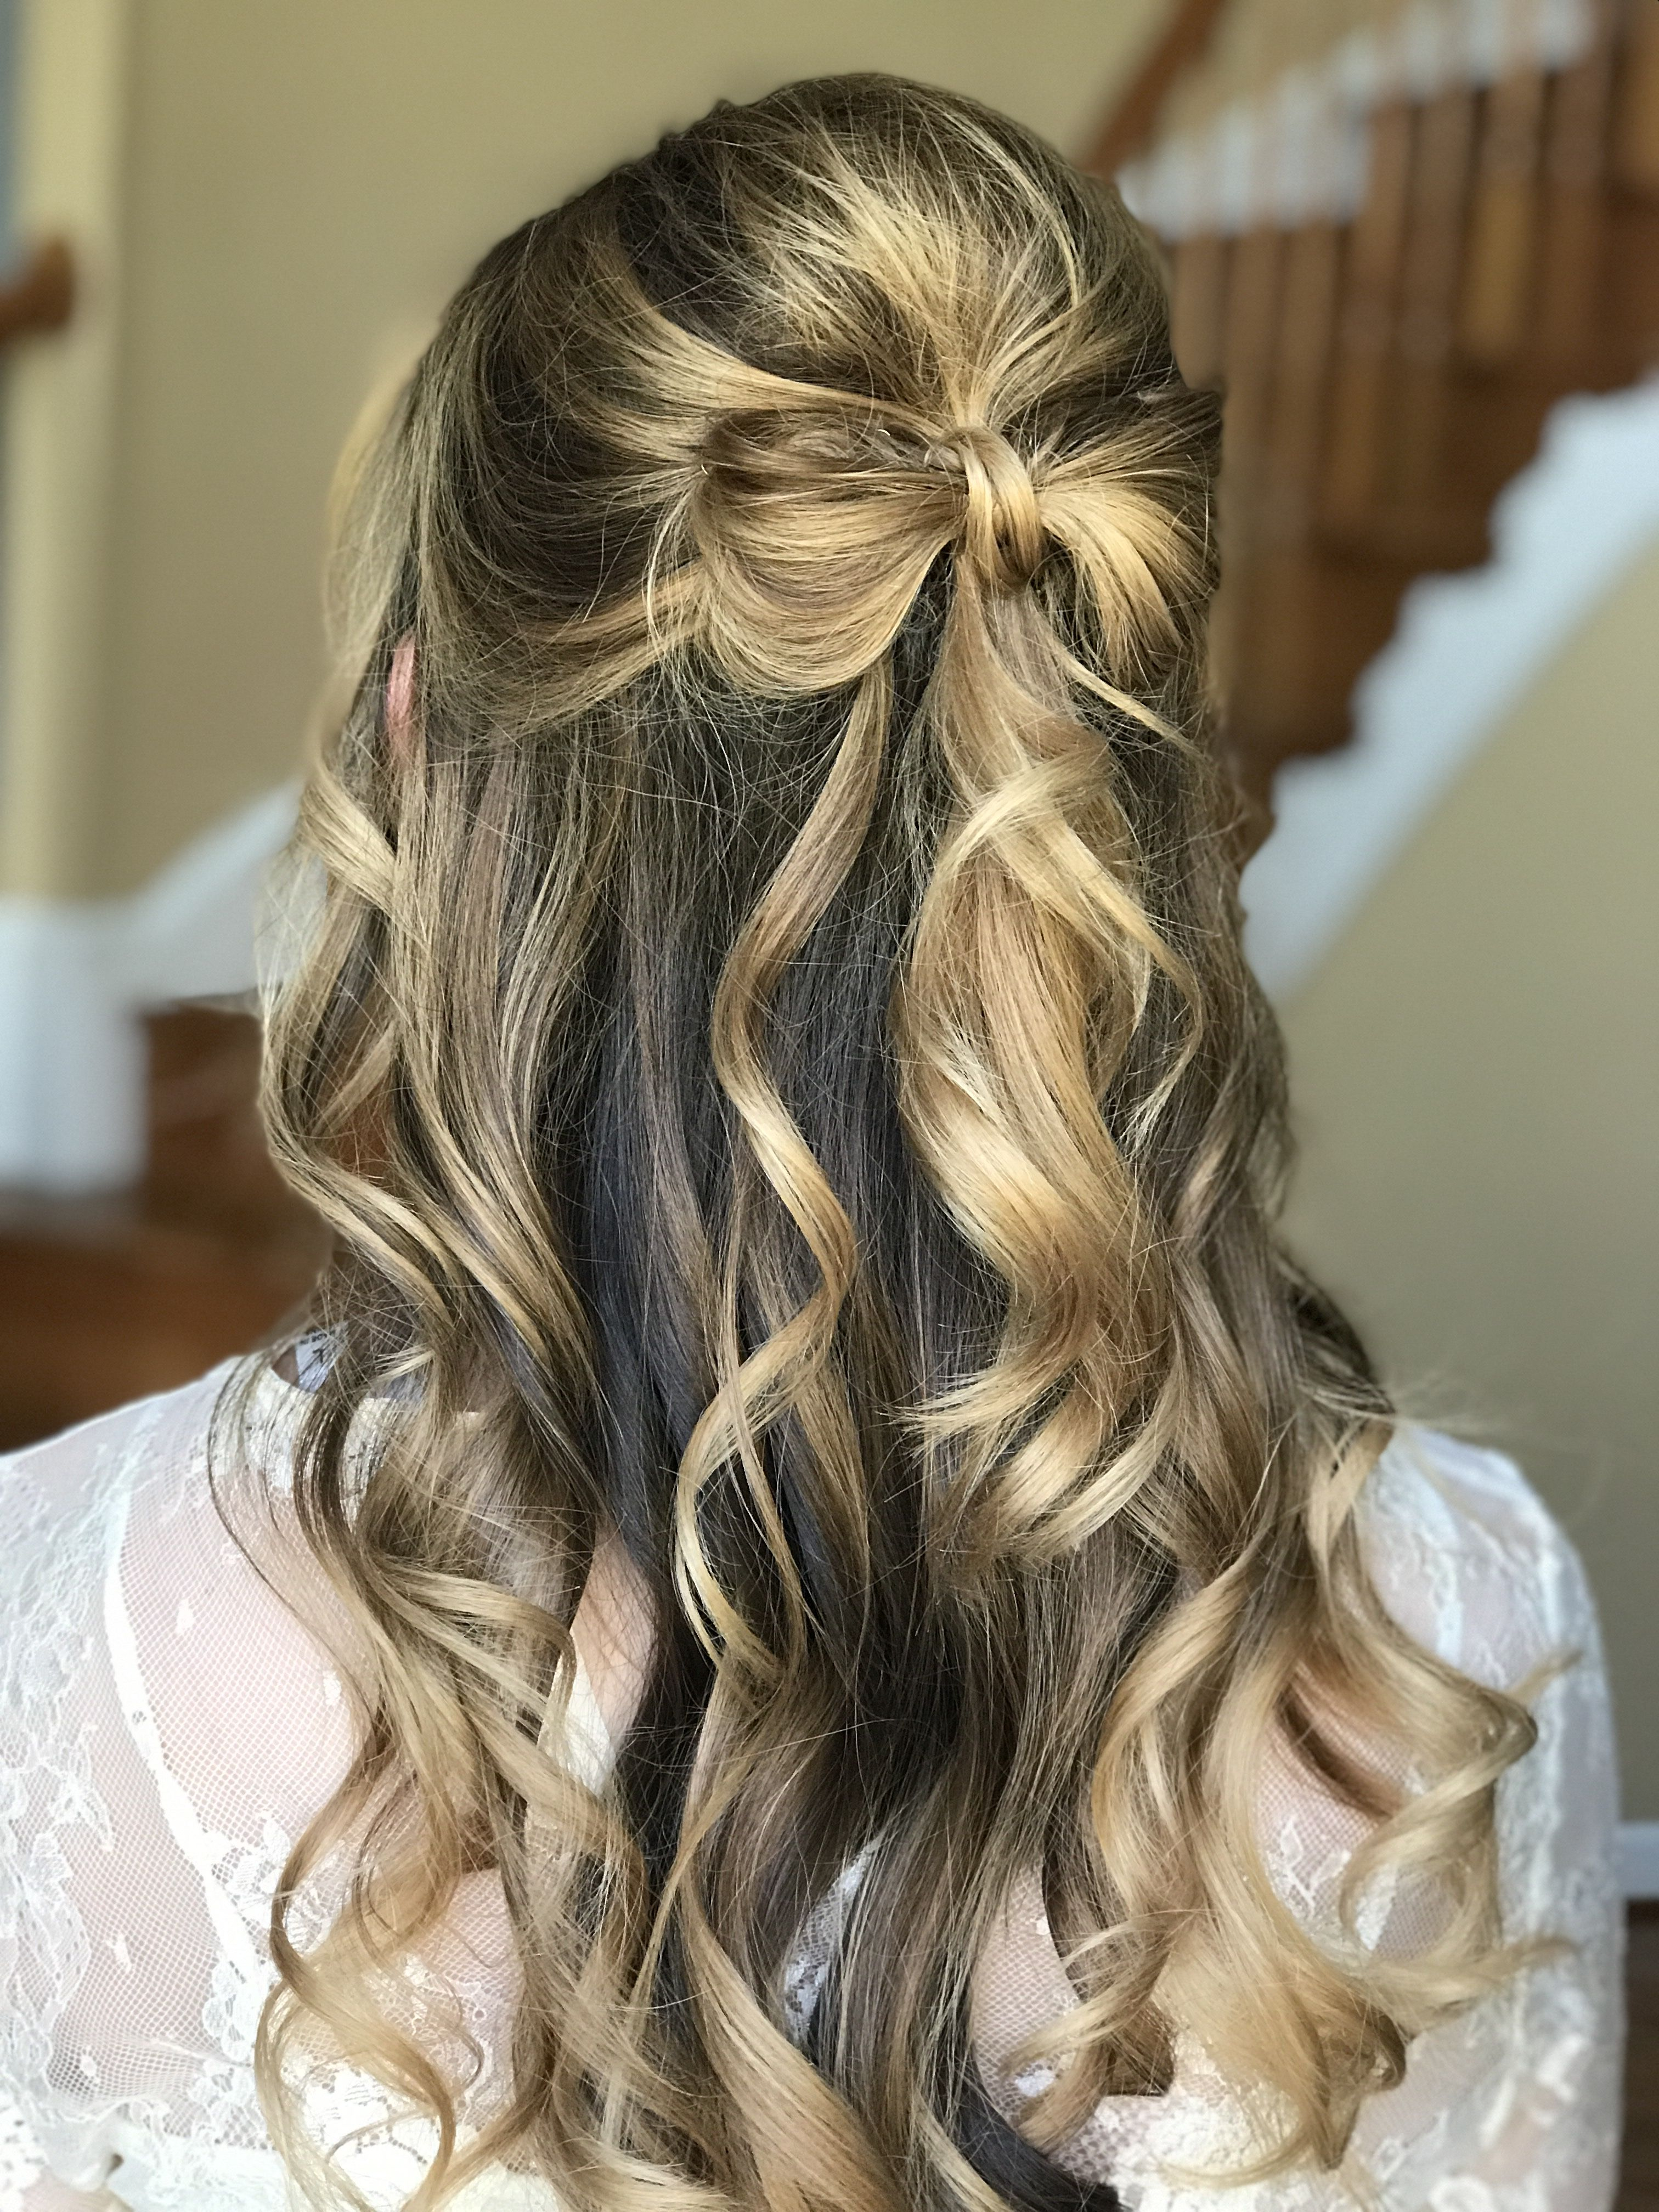 Hair Bow Half Up Half Down Feminine Romantic Fun Bridal Little